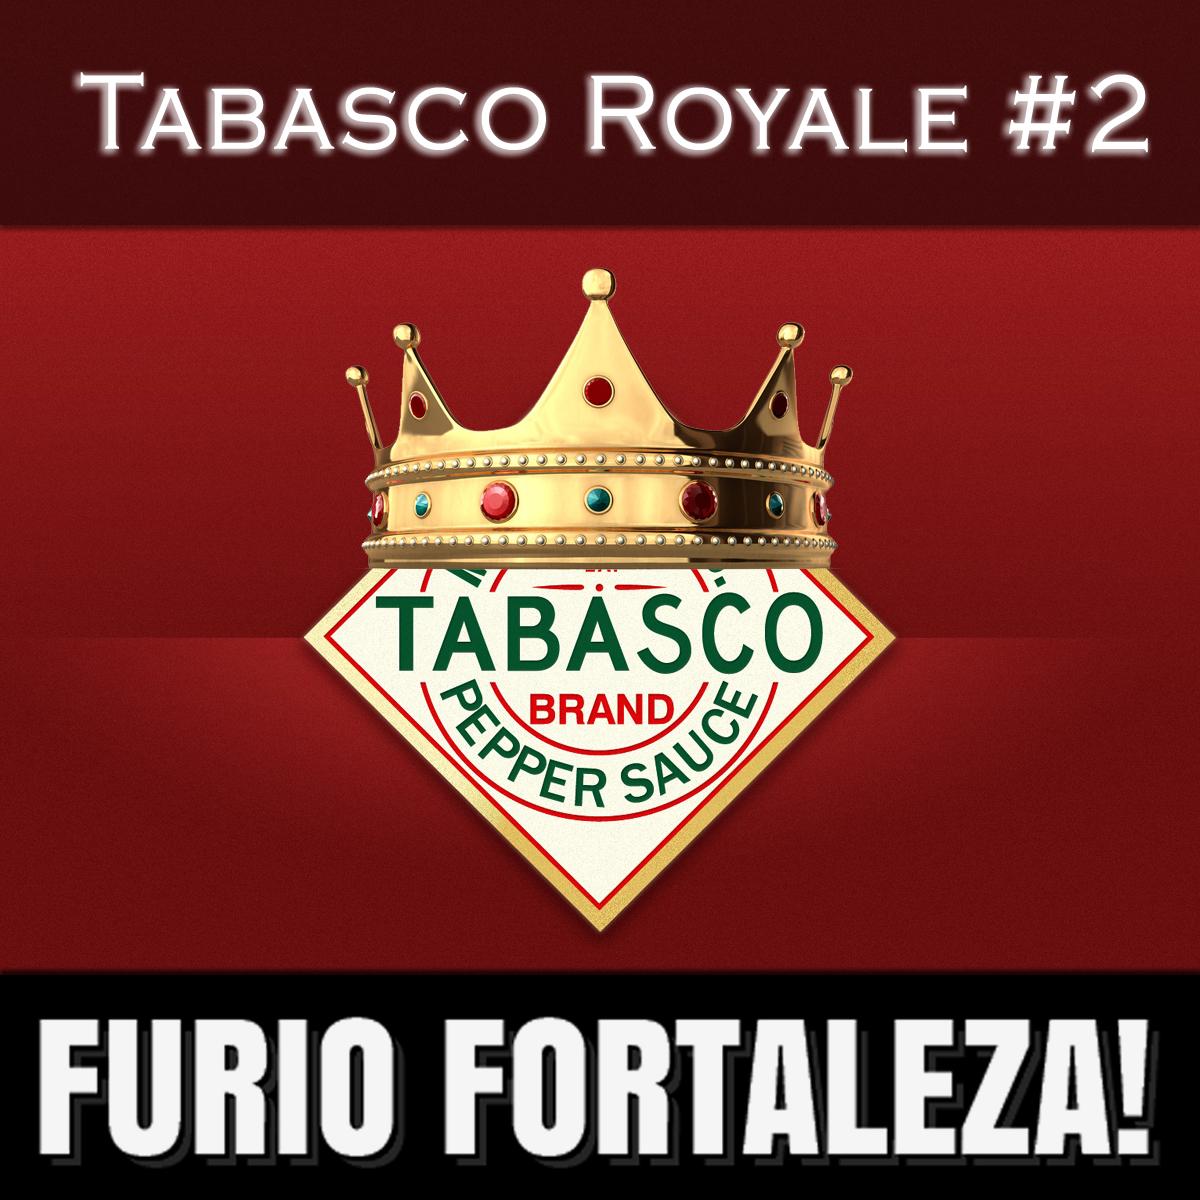 Furio Fortaleza! - 3.3 - Tabasco Royale 2